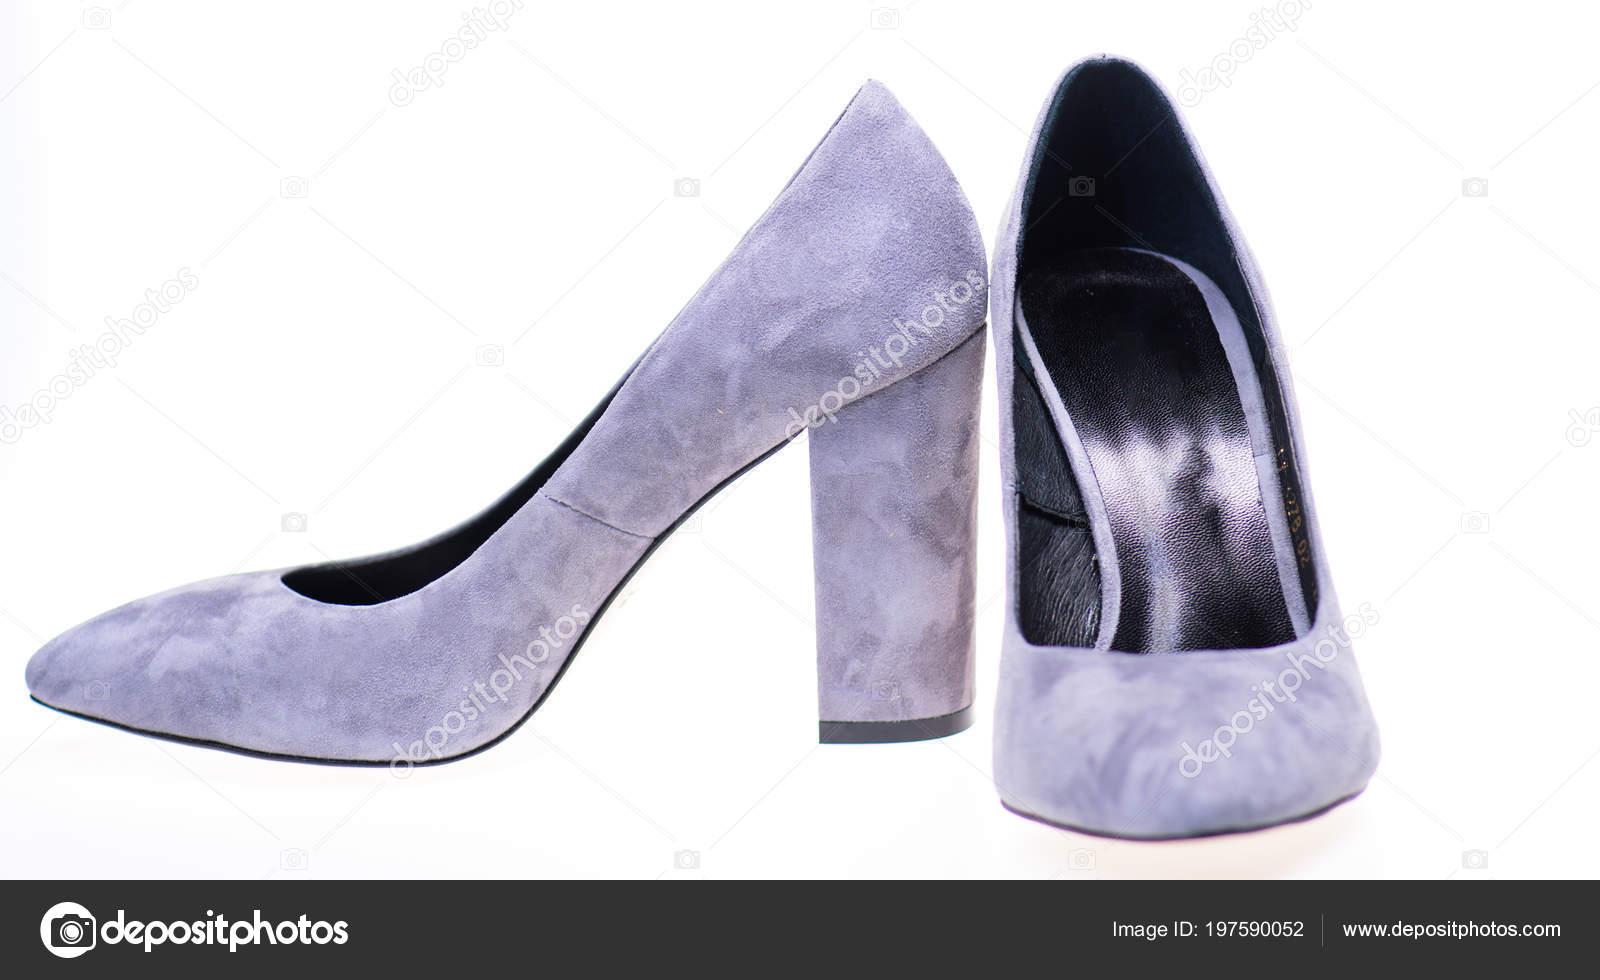 74a6f00a7e4 Ζευγάρι μοντέρνα ψηλοτάκουνα παπούτσια. Γυναικεία υποδήματα έννοια.  Υποδήματα για γυναίκες με πυκνά και ψηλά τακούνια — Εικόνα από ...